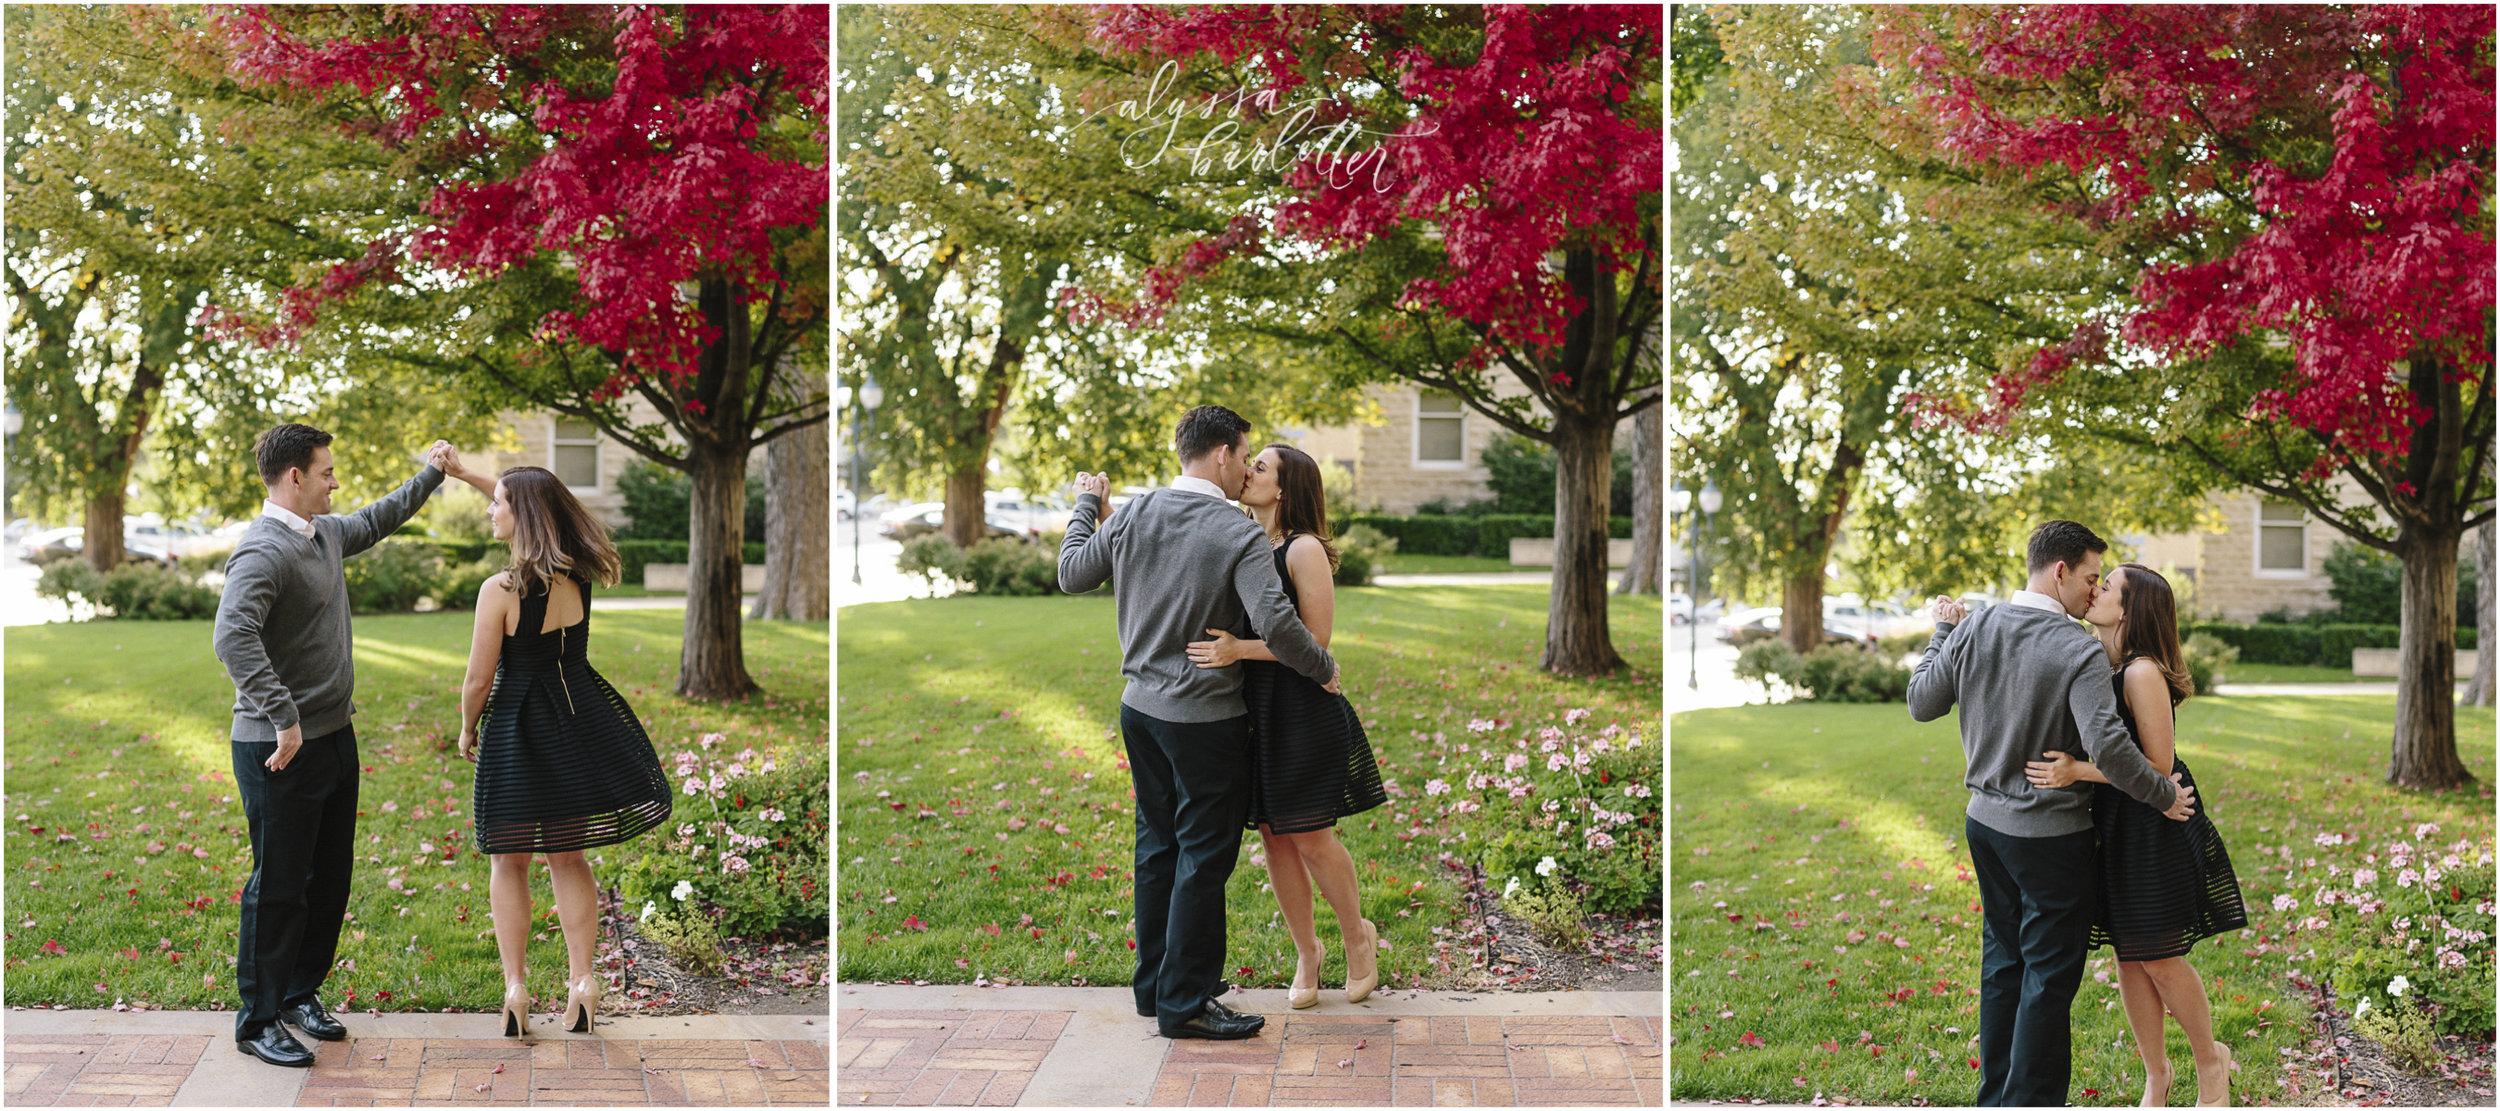 alyssa barletter photography manhattan kansas engagement photos kstate gardens taylor and kirk-1-12.jpg